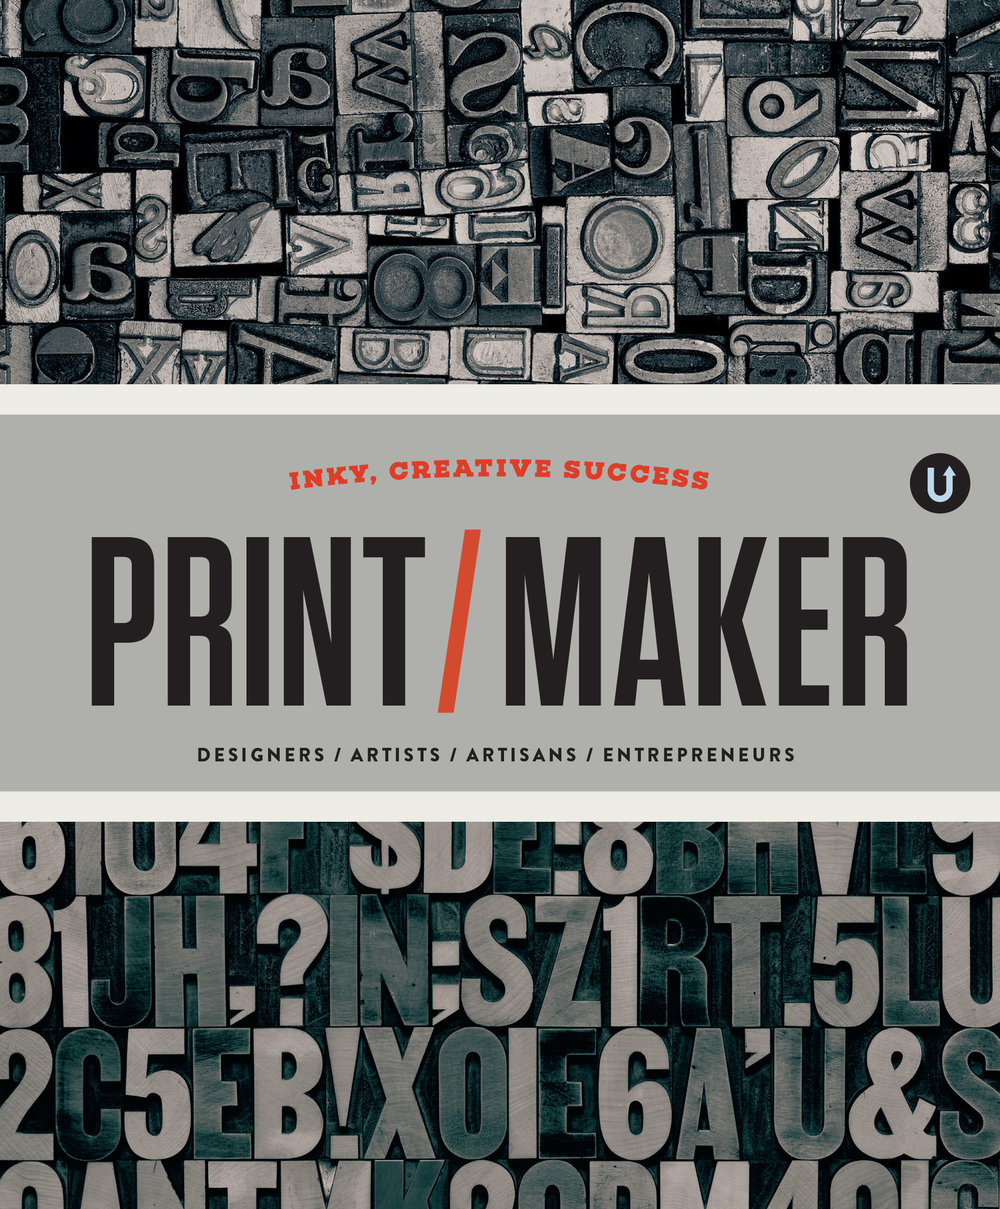 PRINTMAKER+COVER+FINAL.jpg